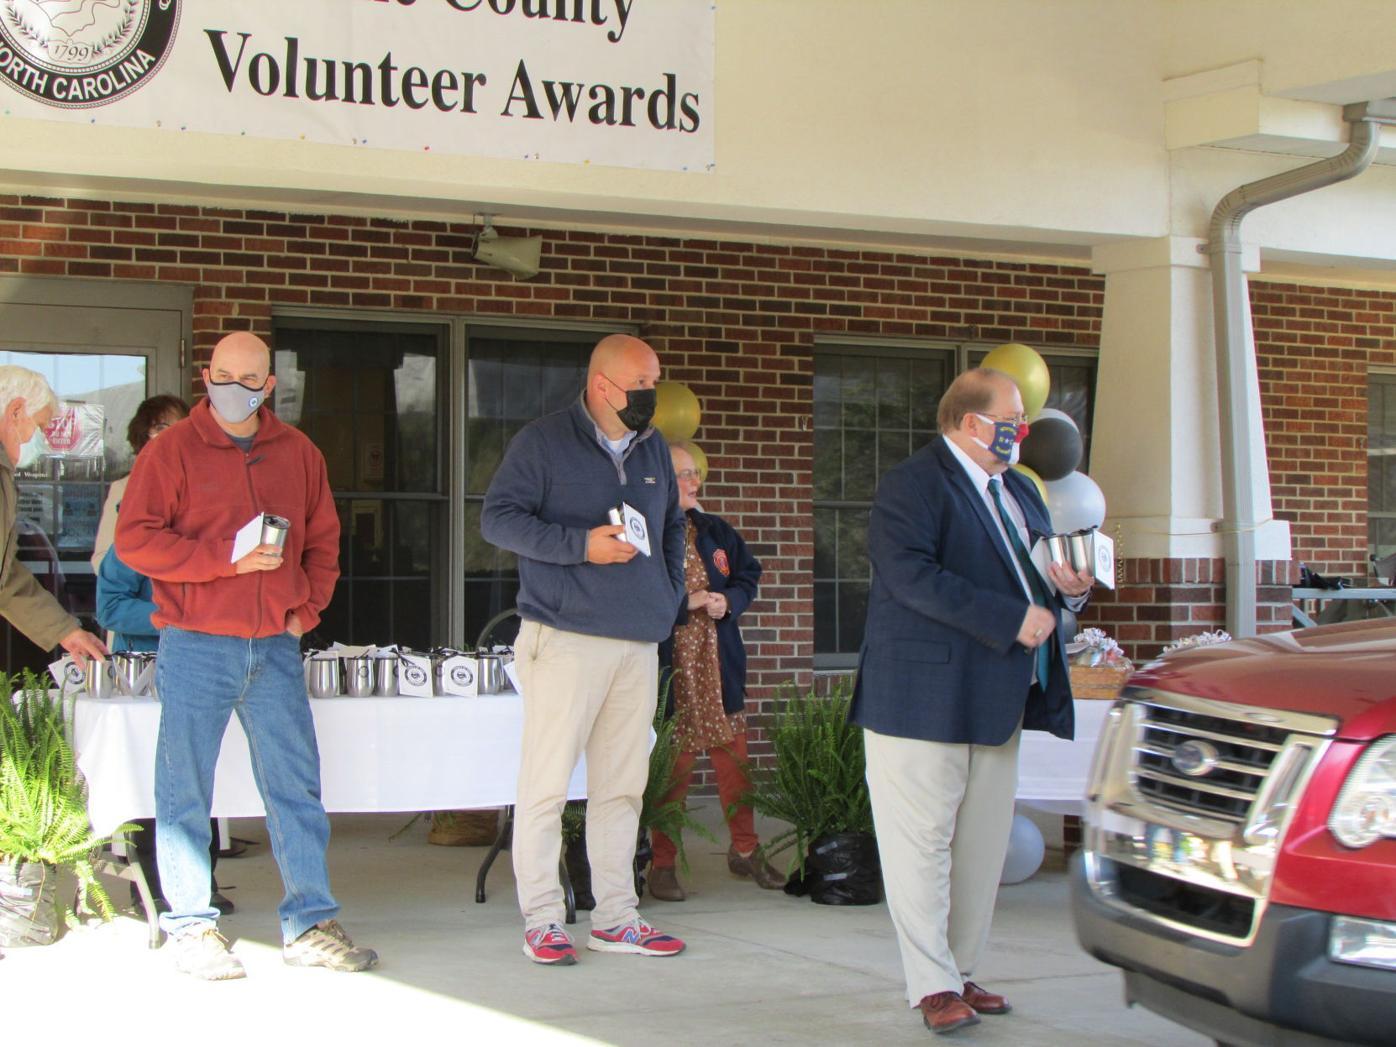 Volunteer Awards BOC